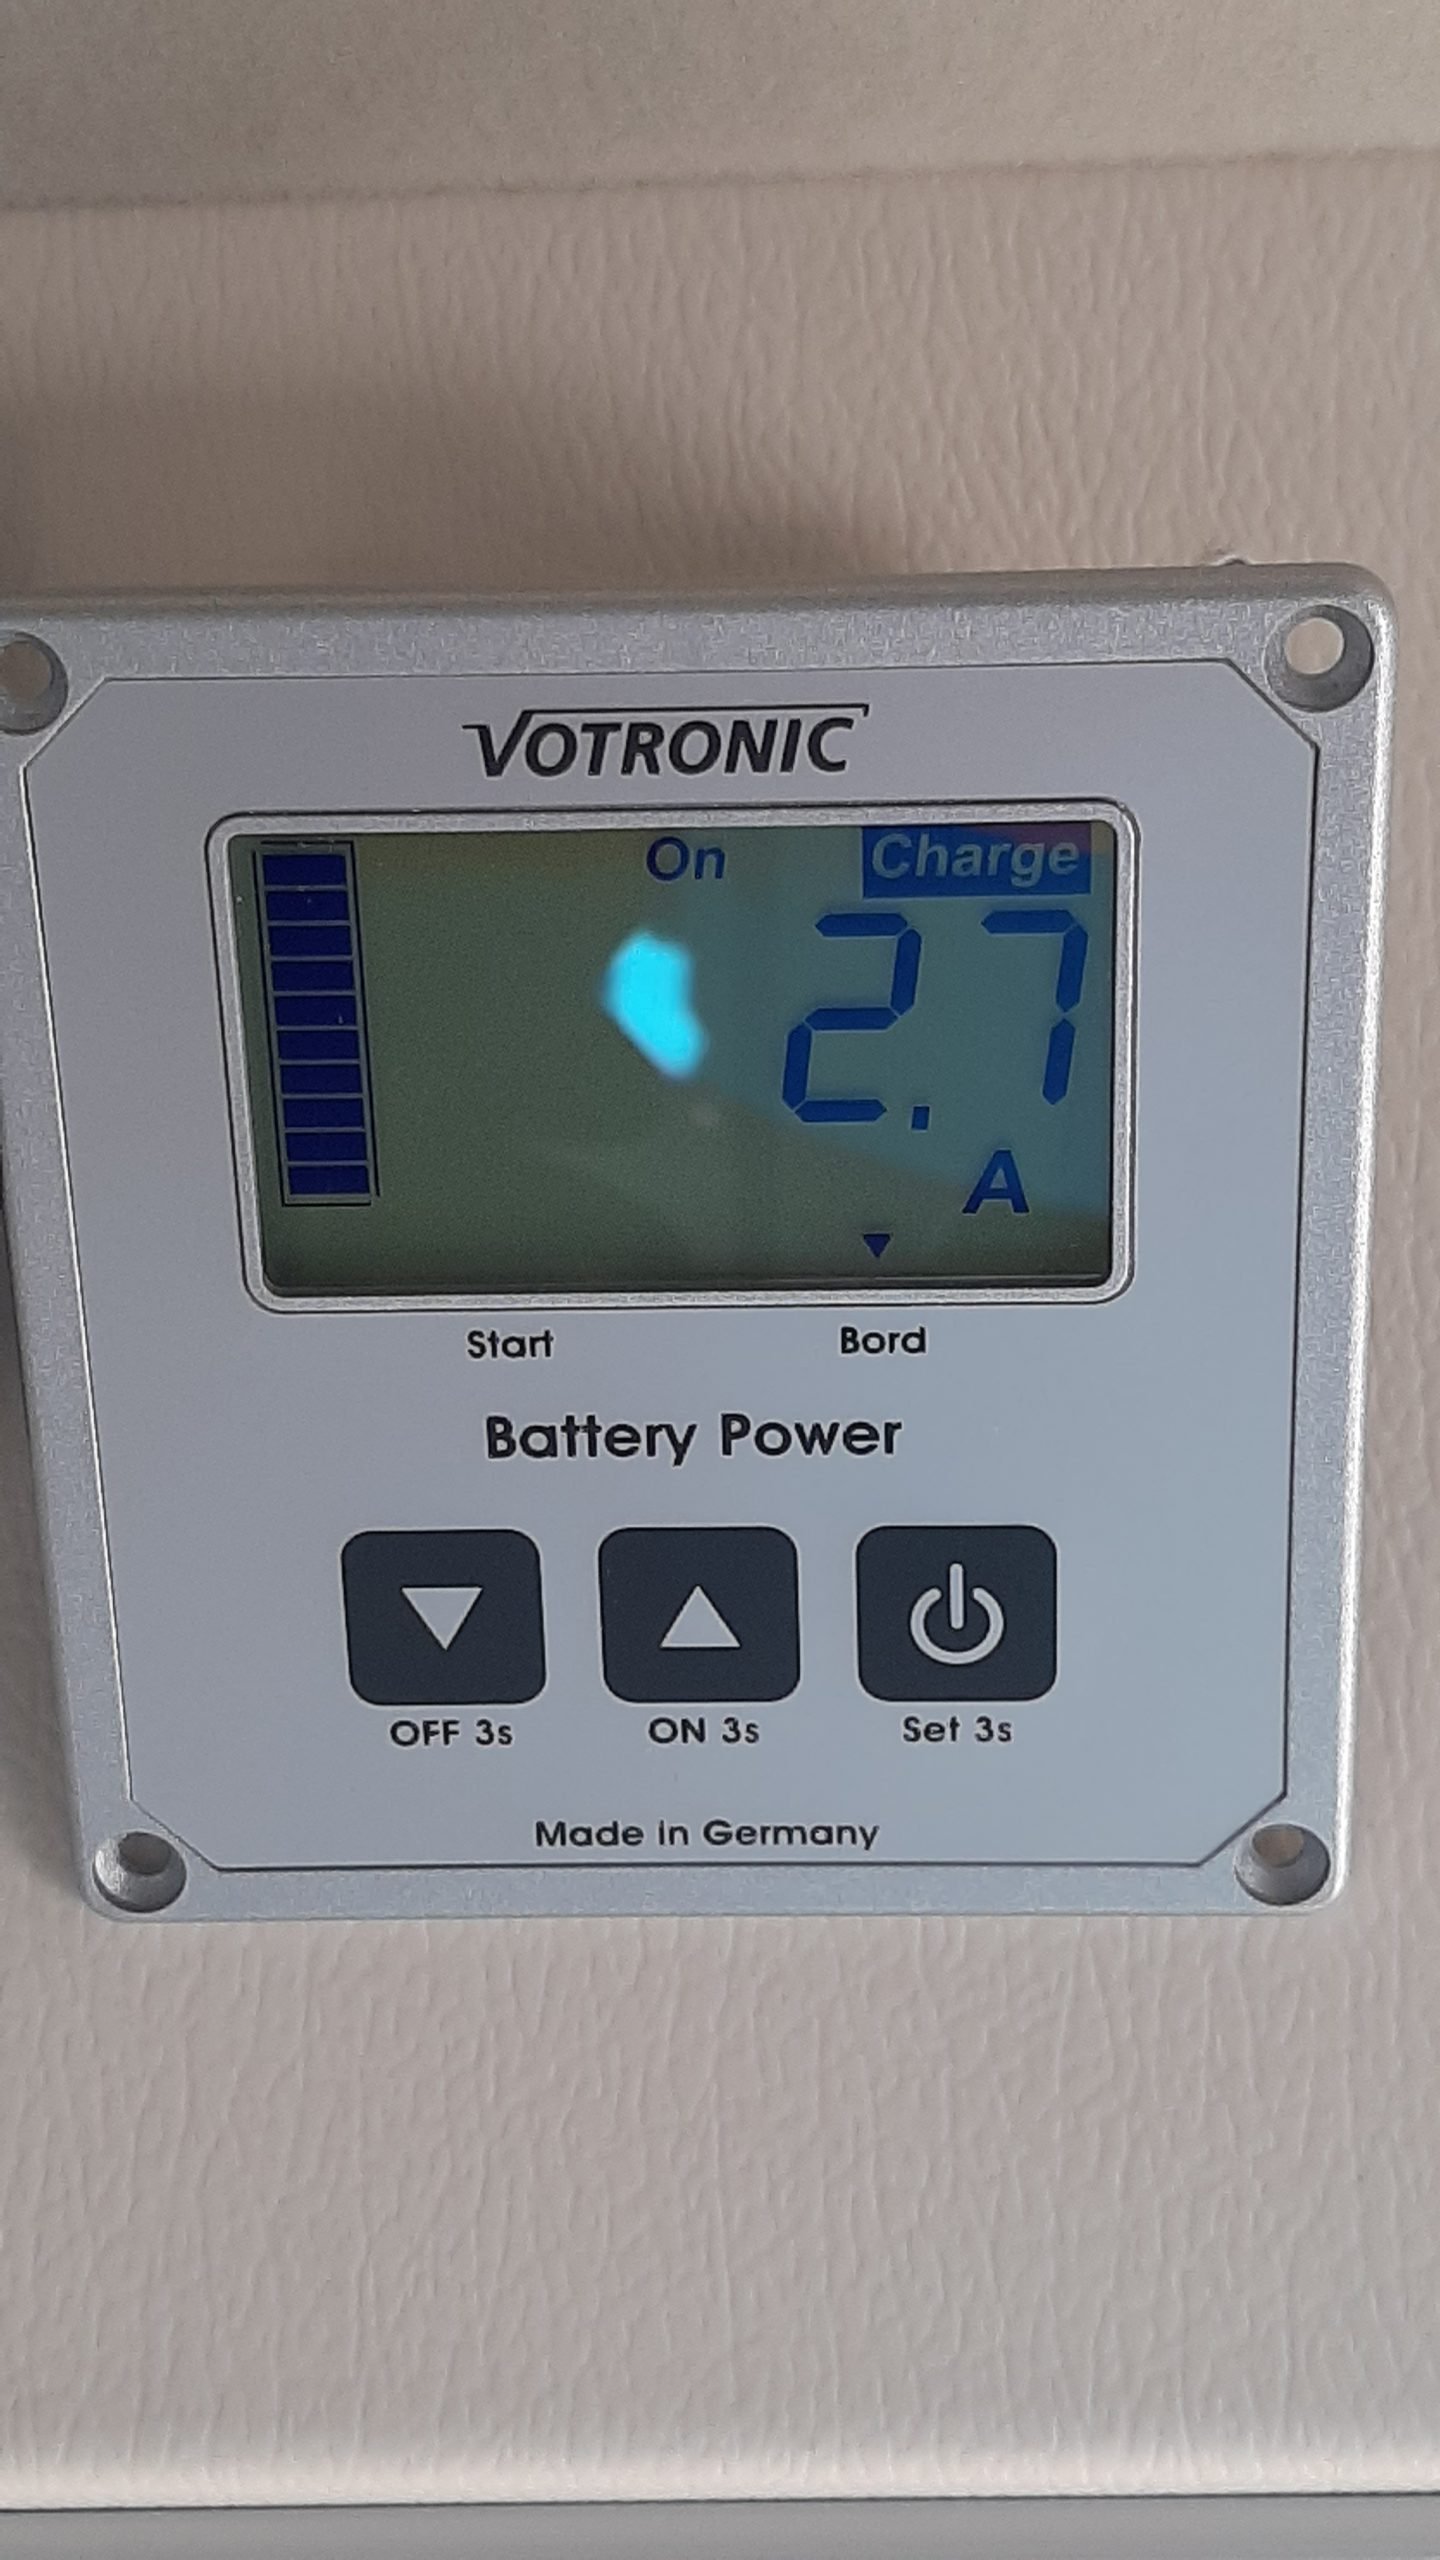 VOTRONIC Solarpower